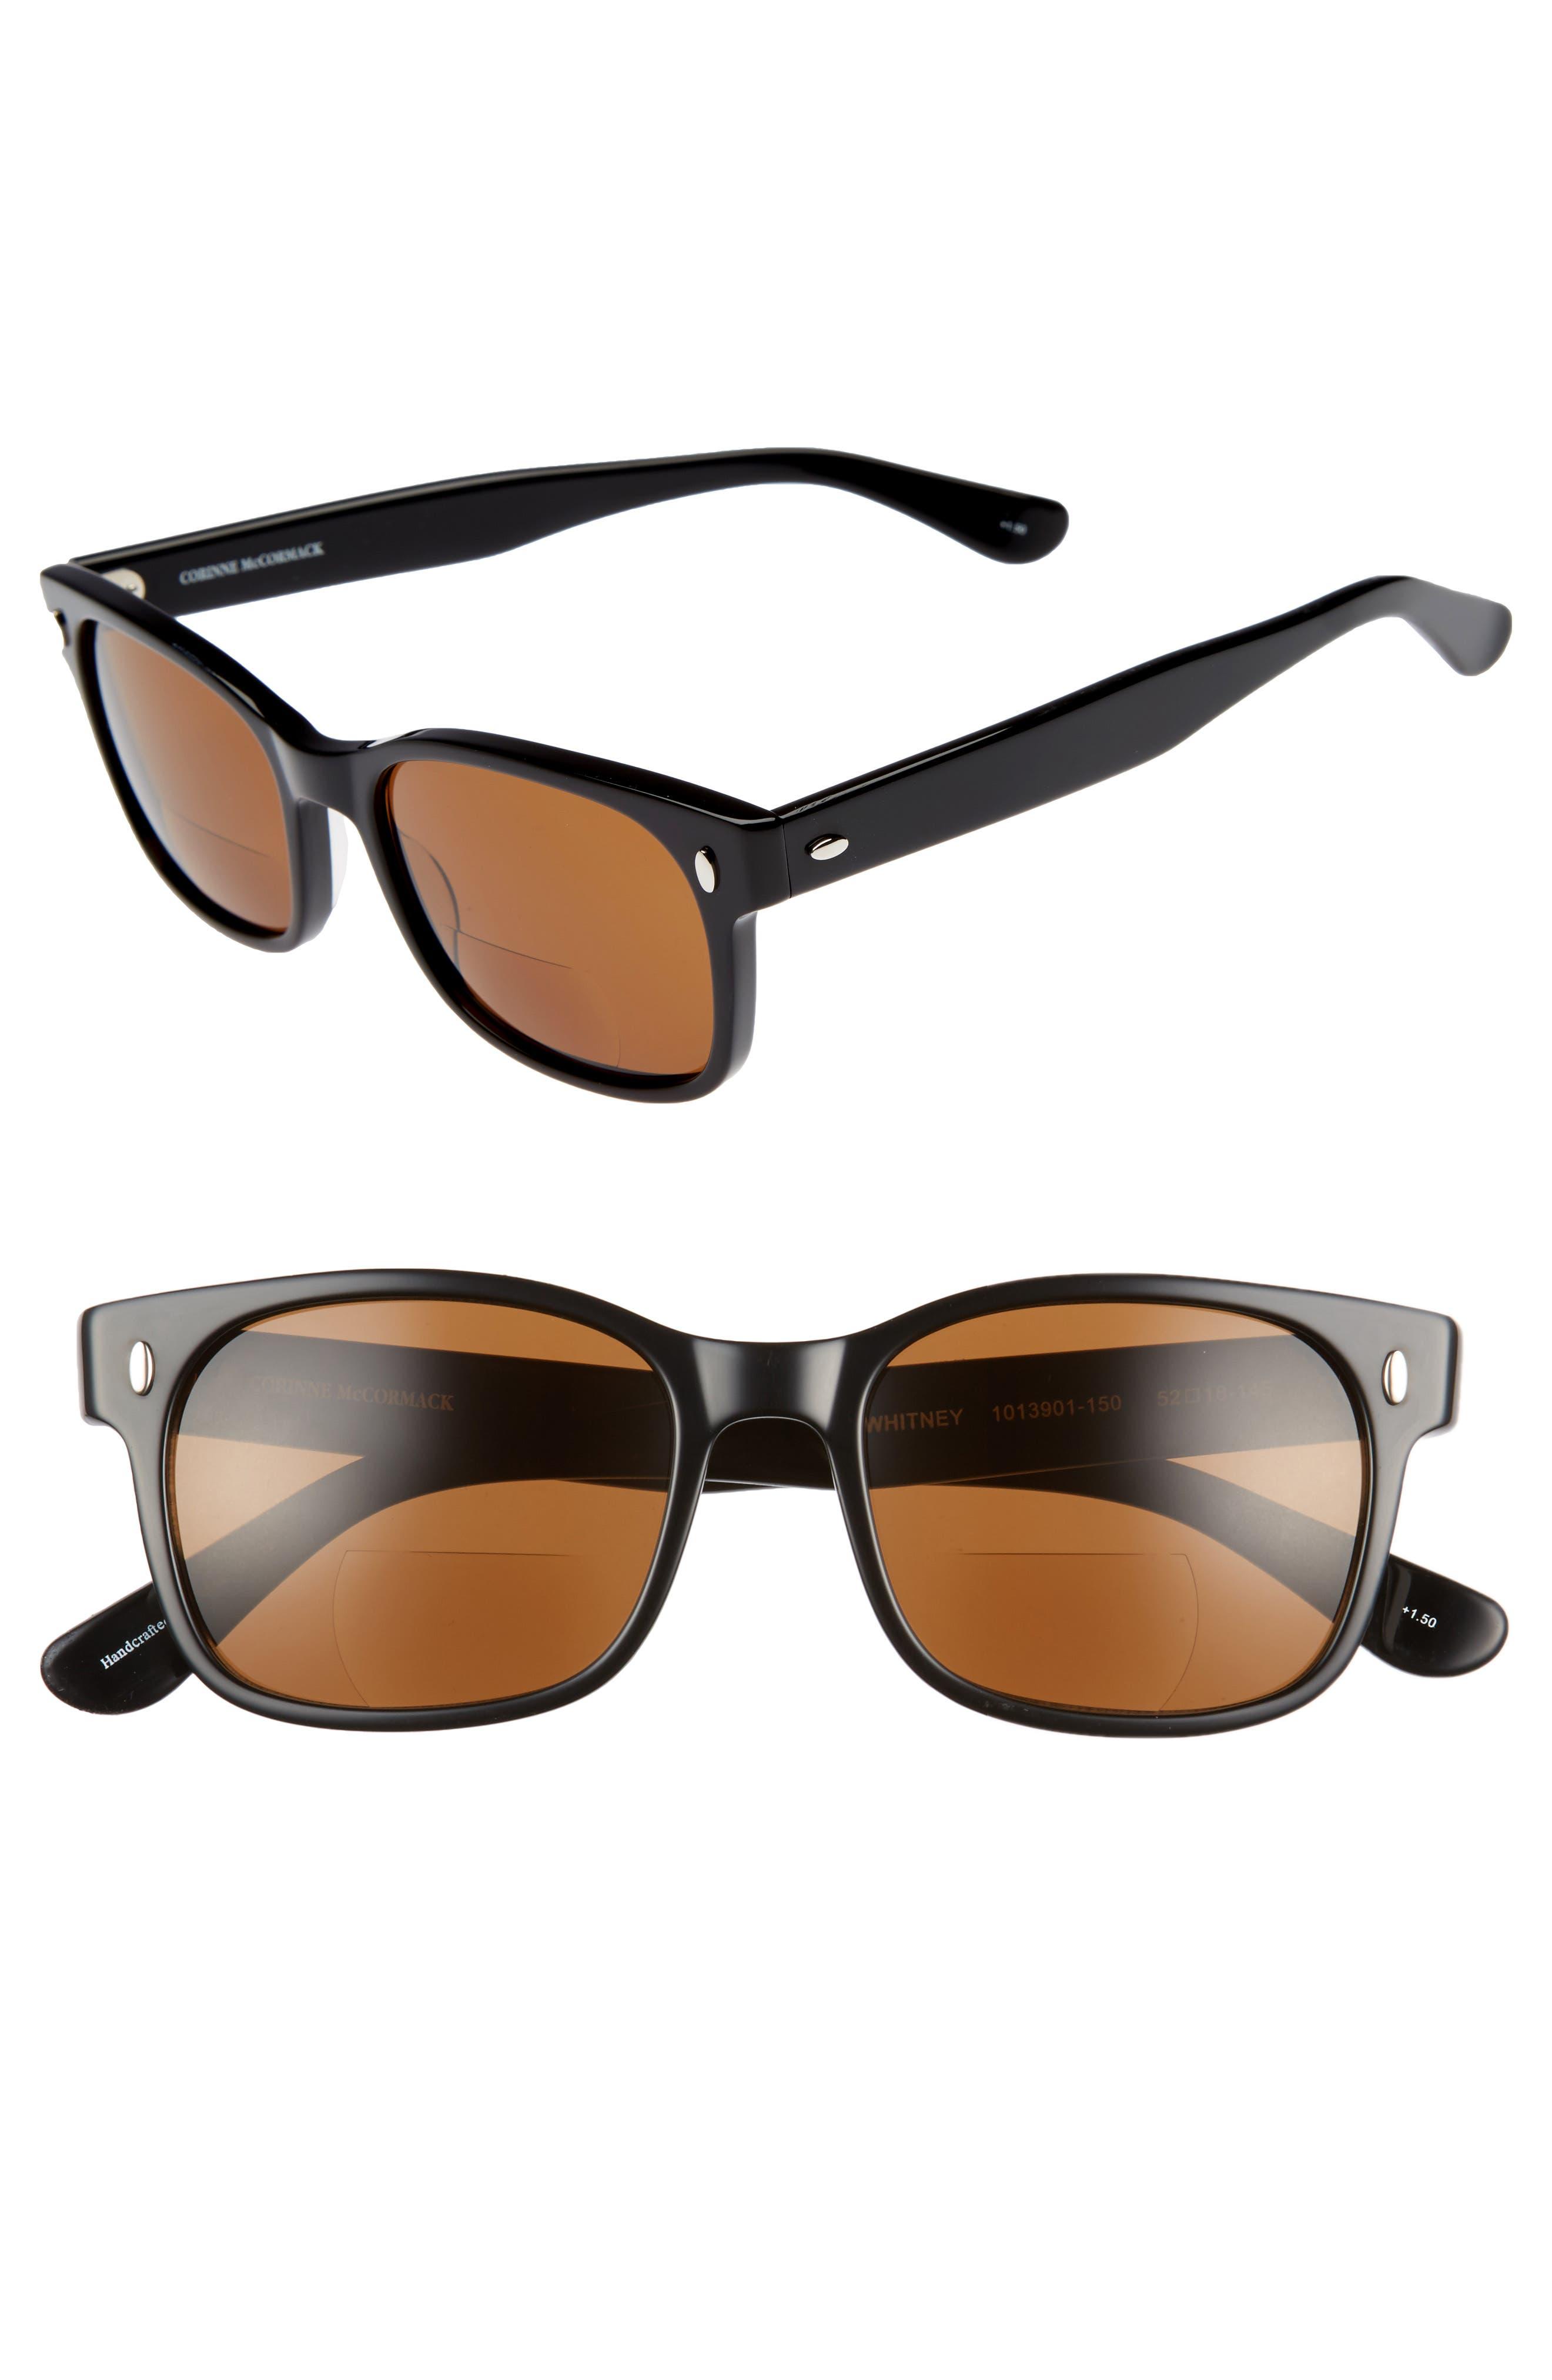 Whitney 52mm Reading Sunglasses,                             Main thumbnail 1, color,                             Black